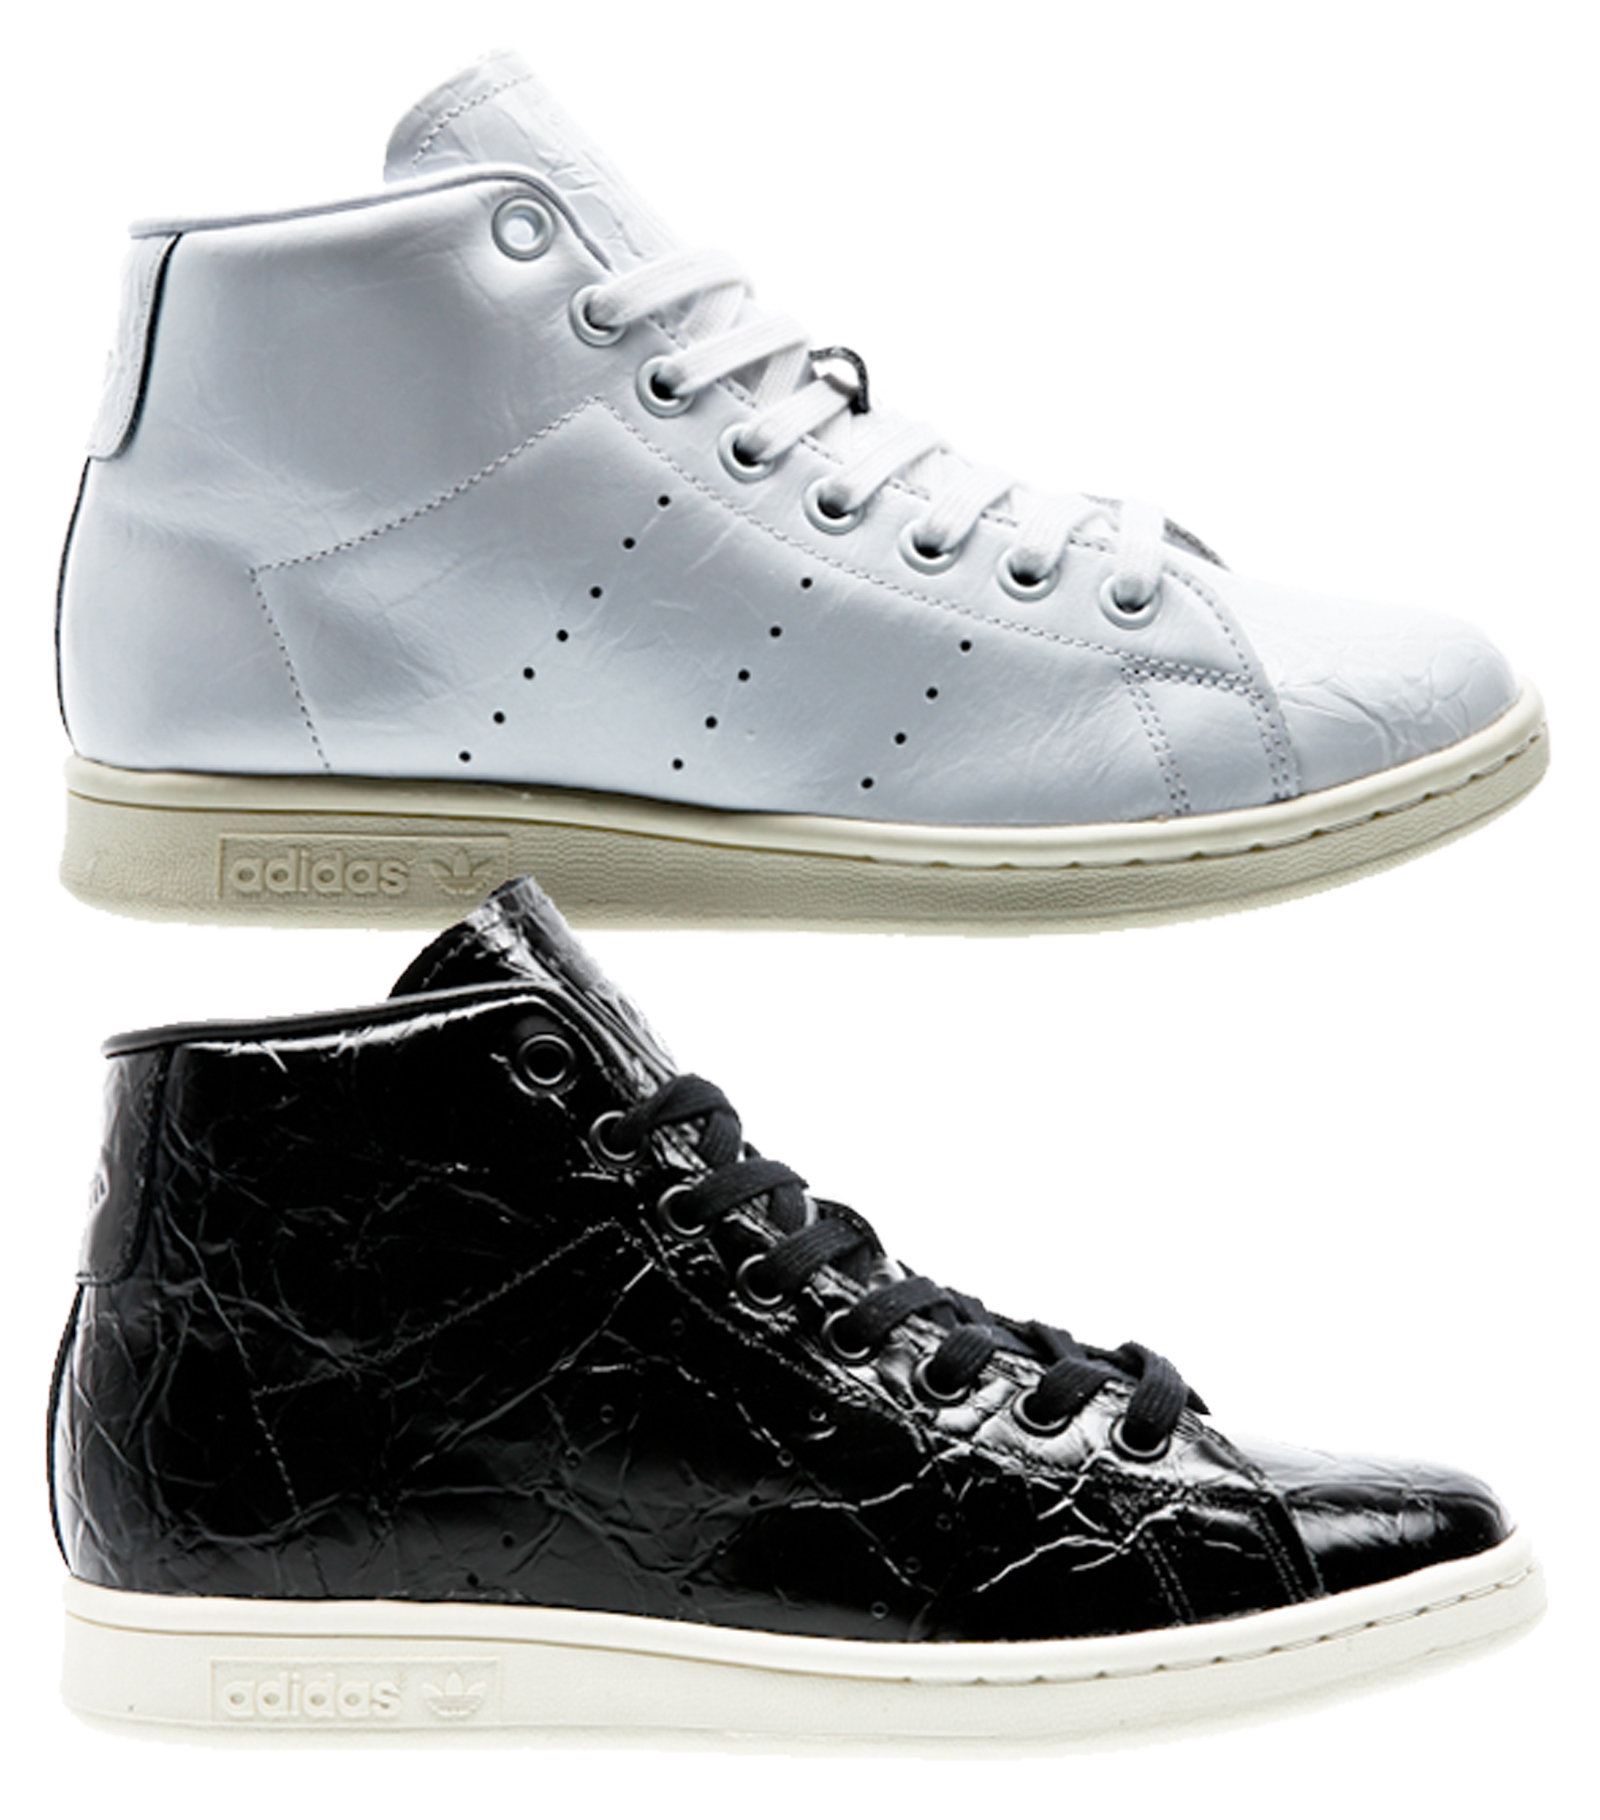 new styles c4c86 bfe97 zapatos Adidas Stan Smith Mid W blanco negro zapatillas de mujer